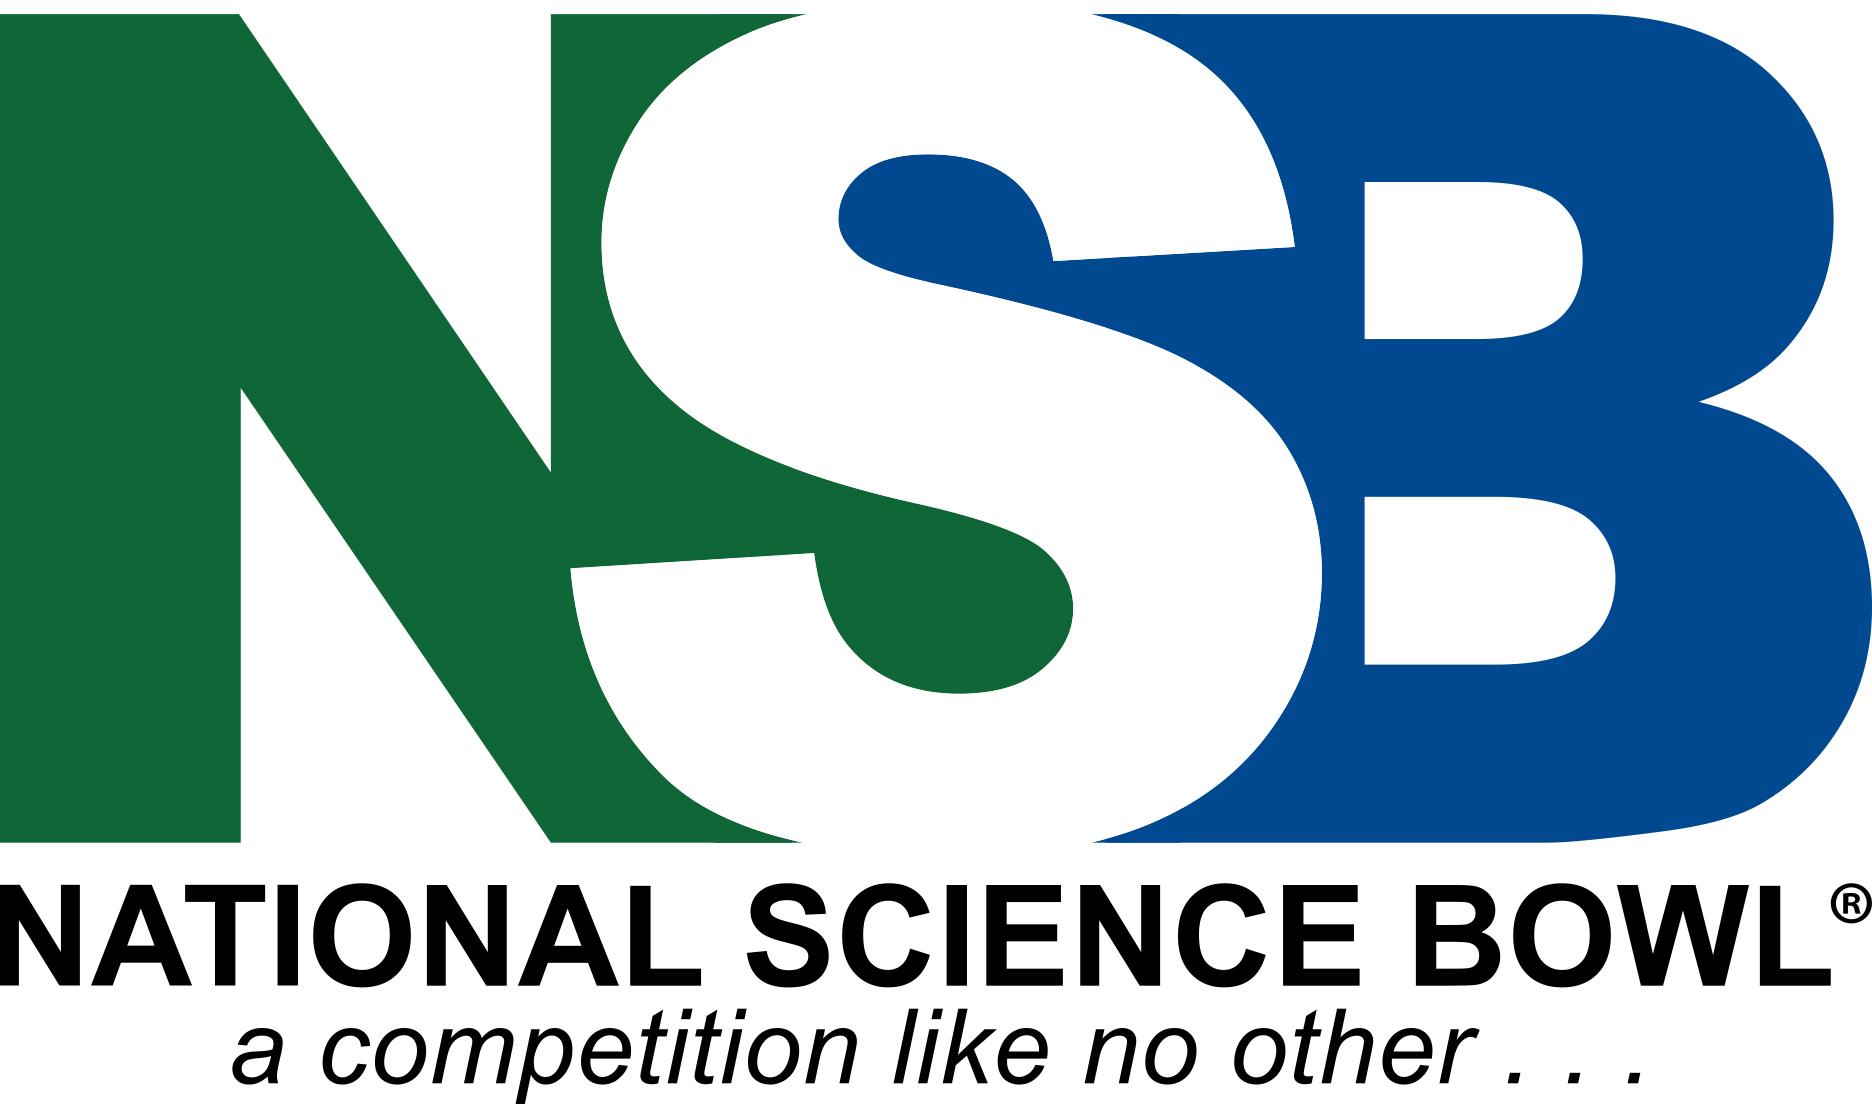 National Science Bowl全美科学碗